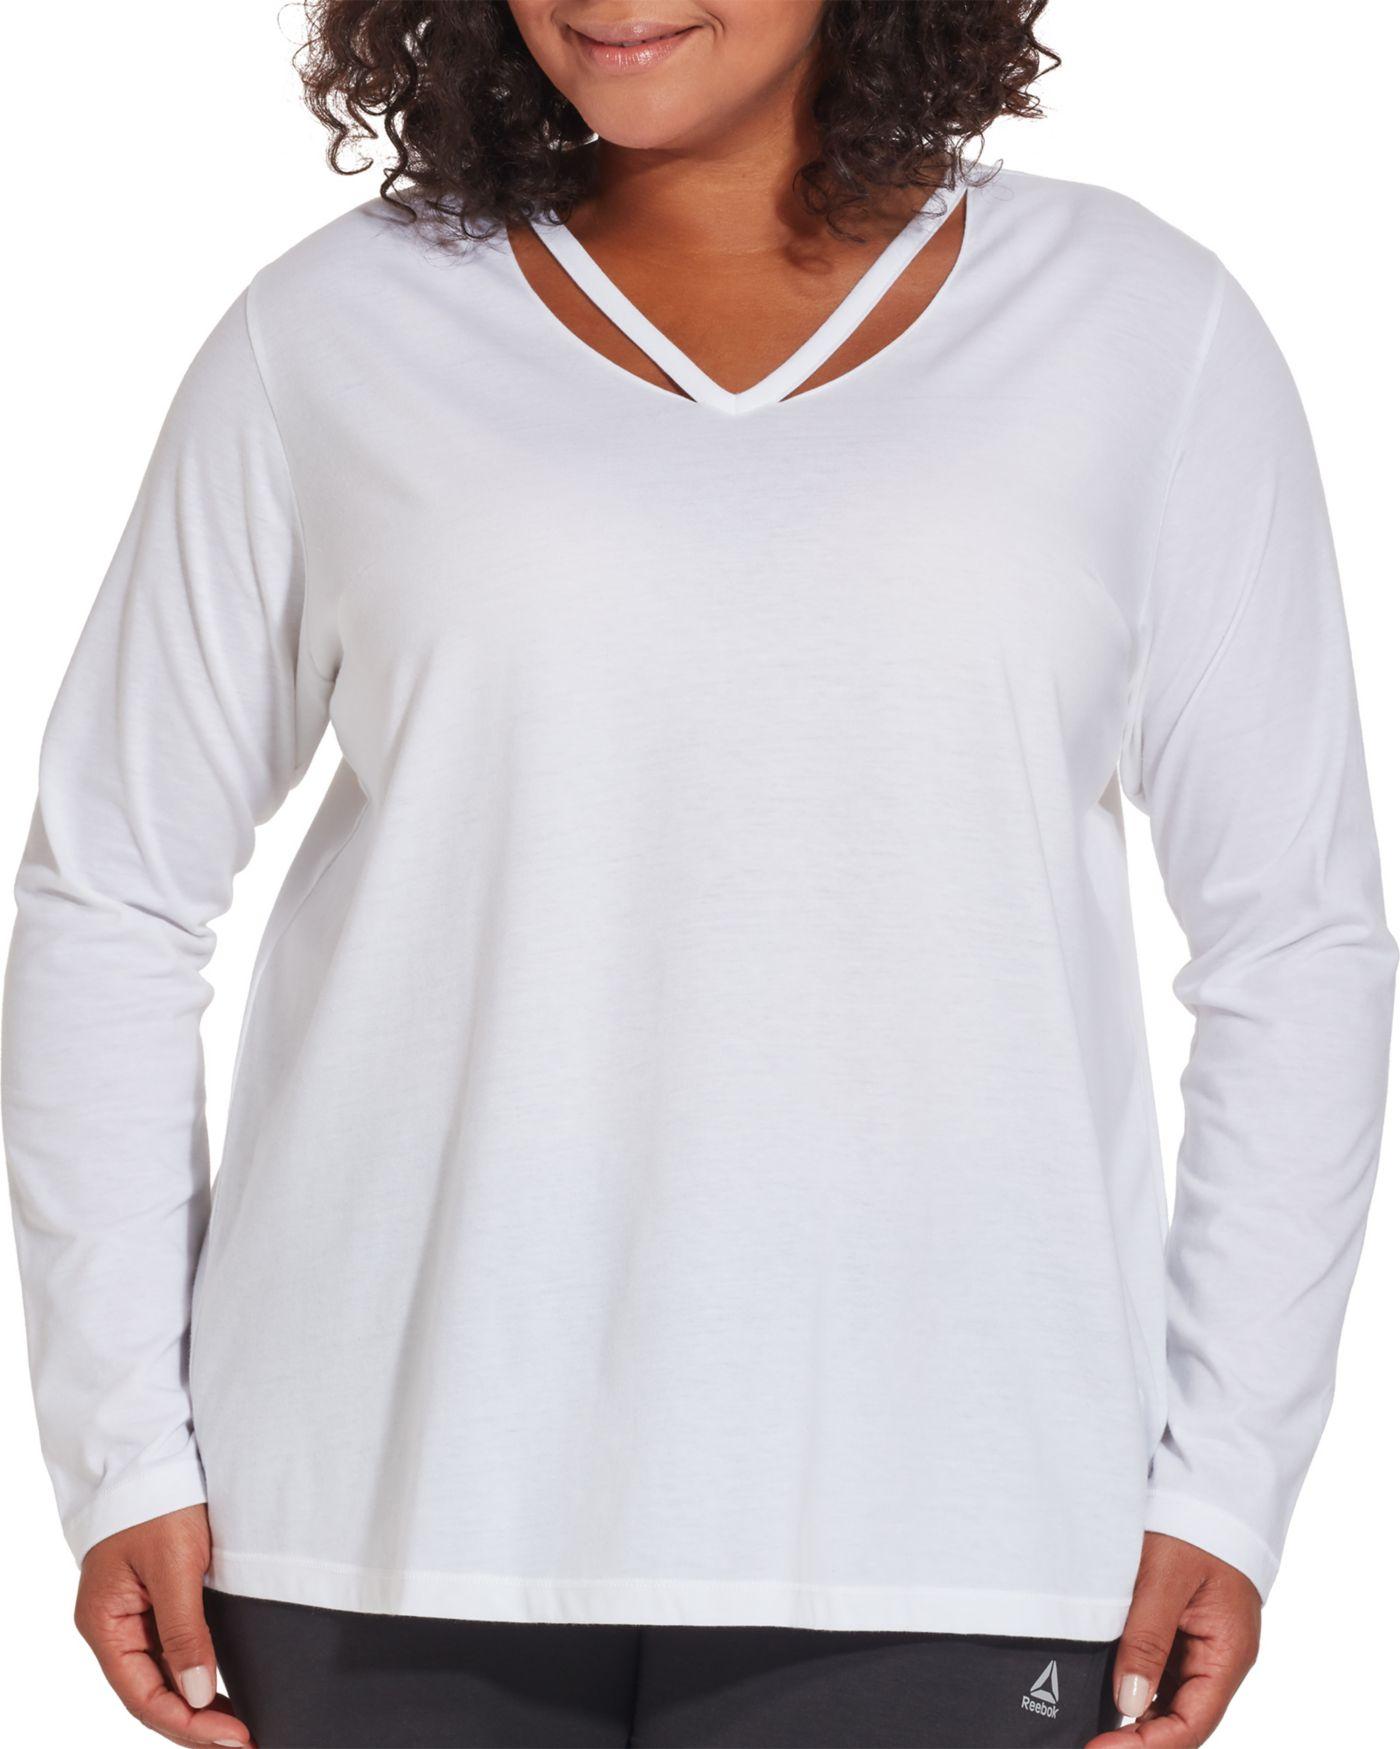 Reebok Women's Plus Size Cotton Split Back Long Sleeve Shirt